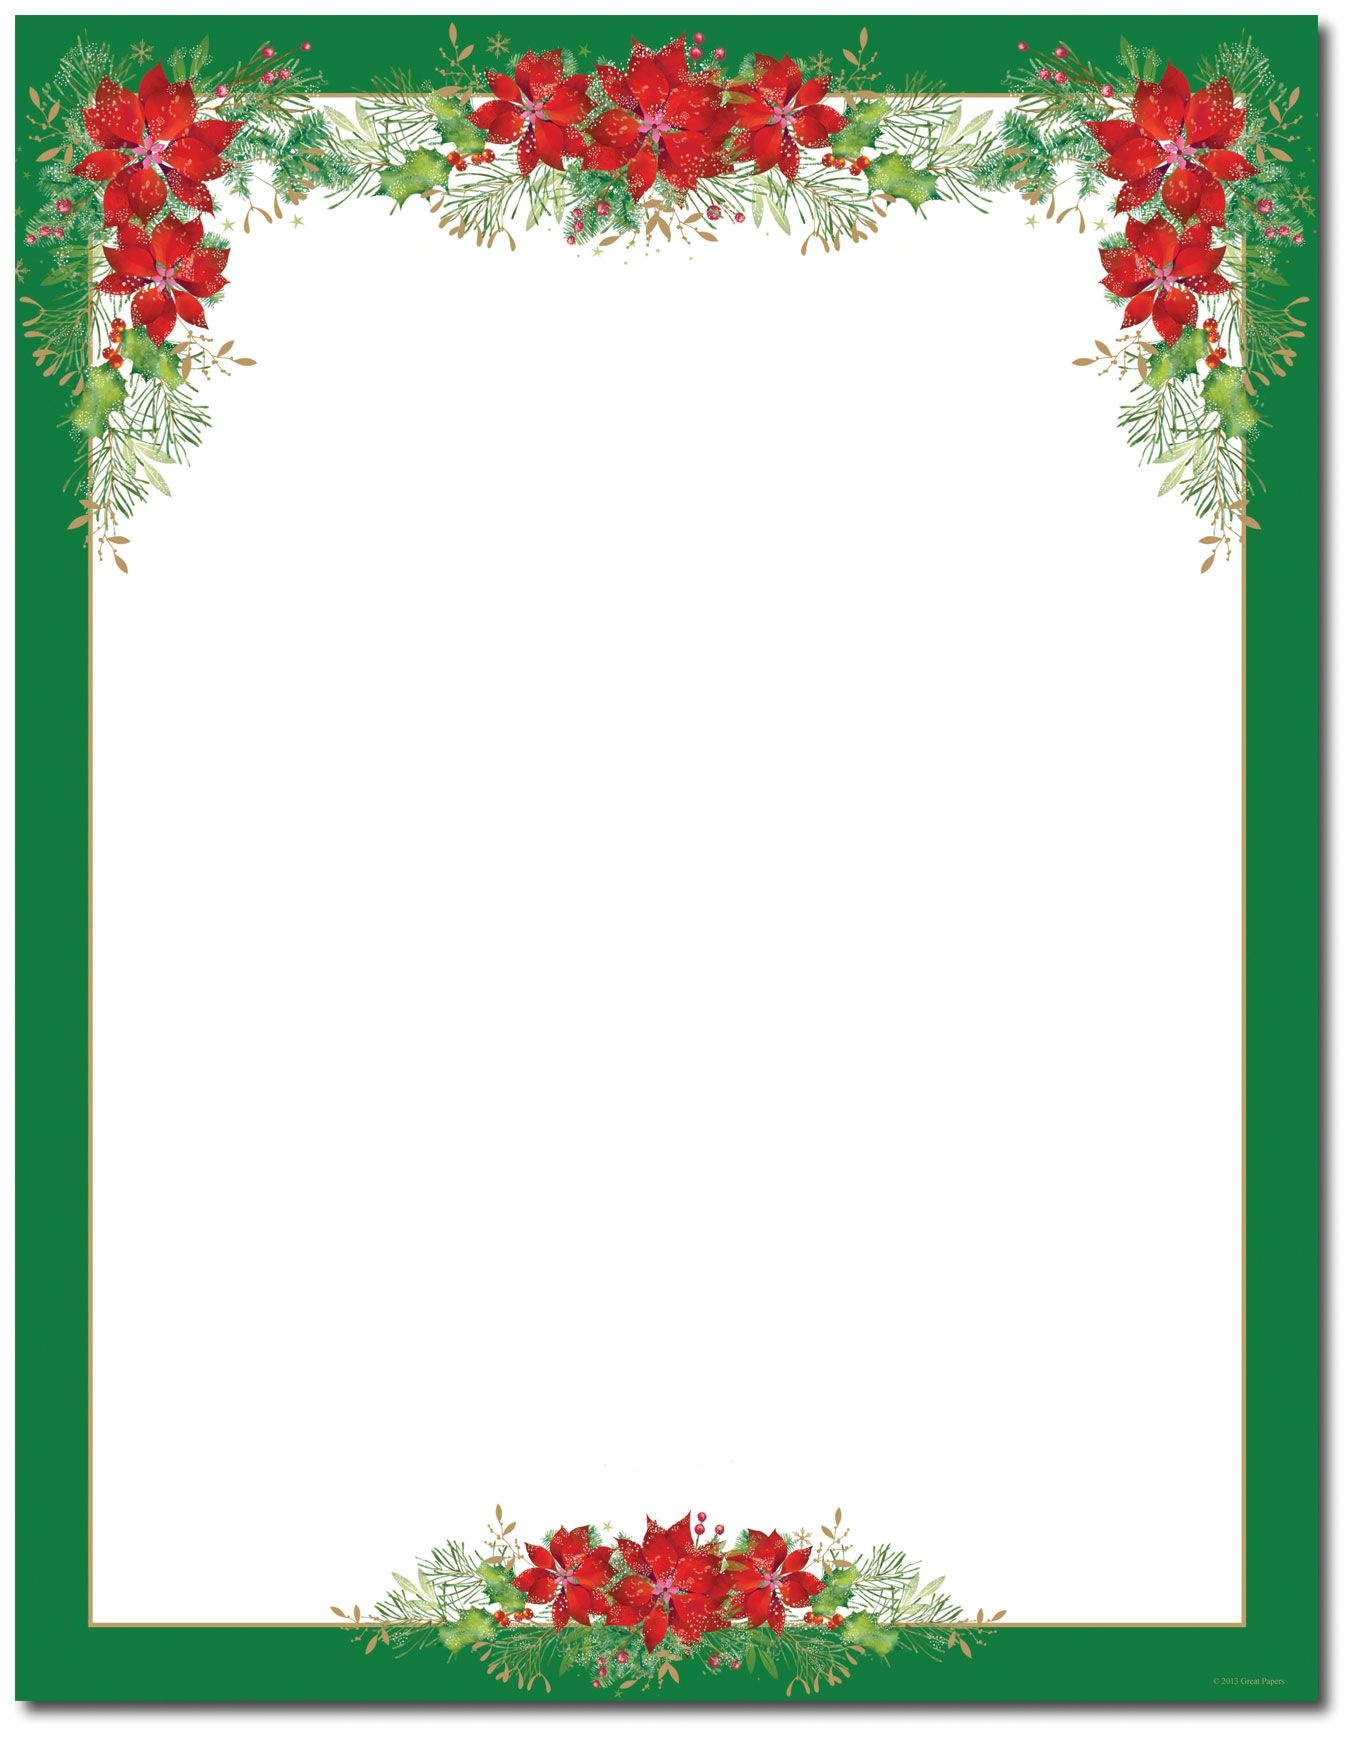 Poinsettia Valance Letterhead | Holiday Papers | Christmas Border - Free Printable Christmas Stationary